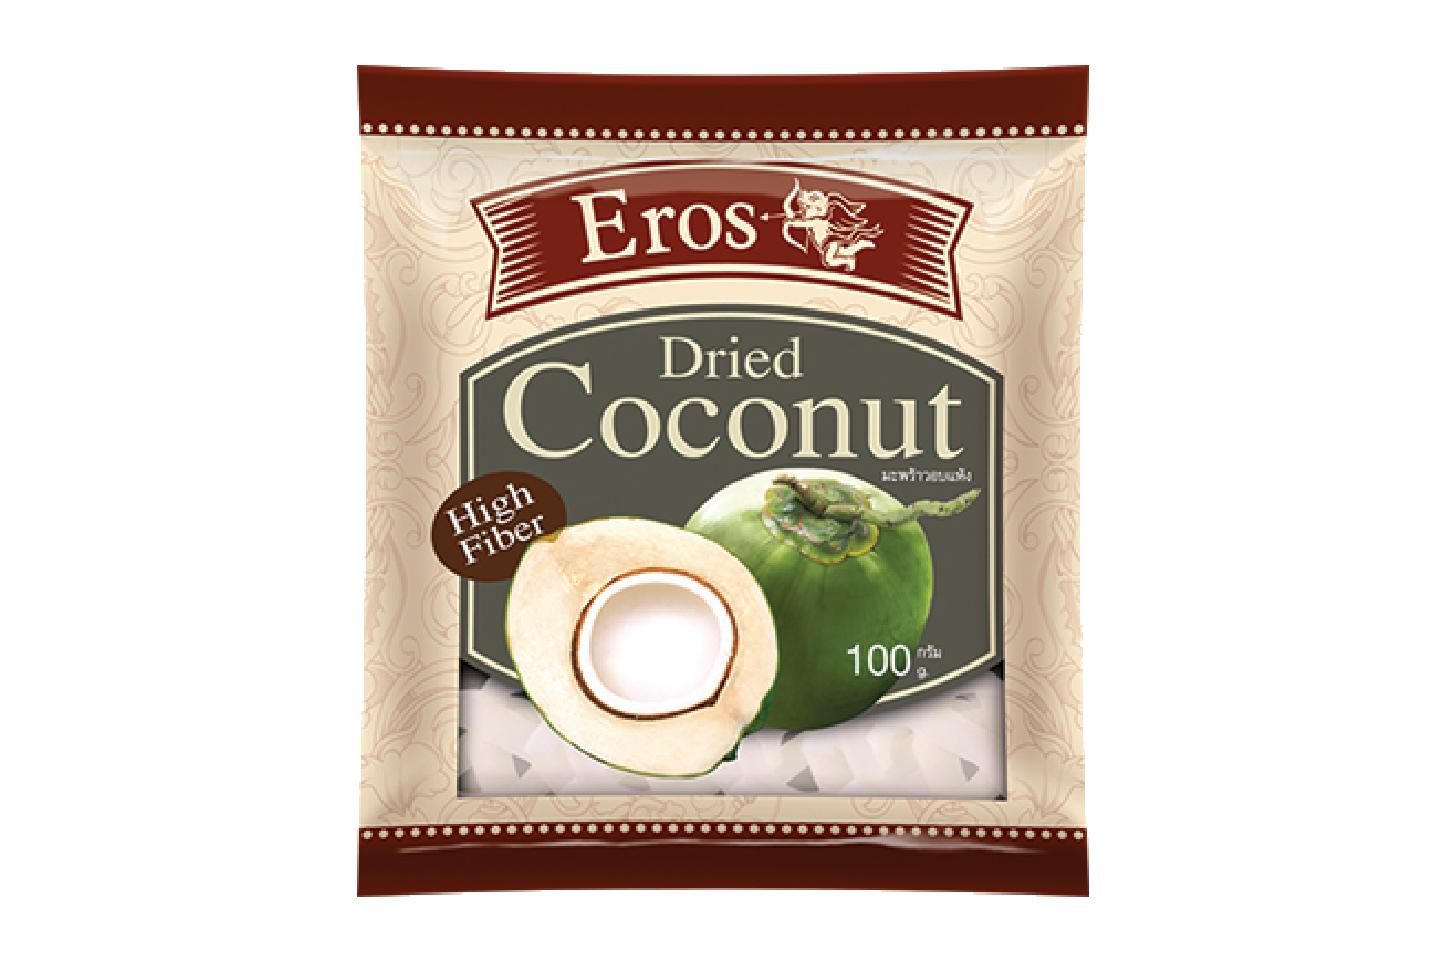 EROS Dried Coconut